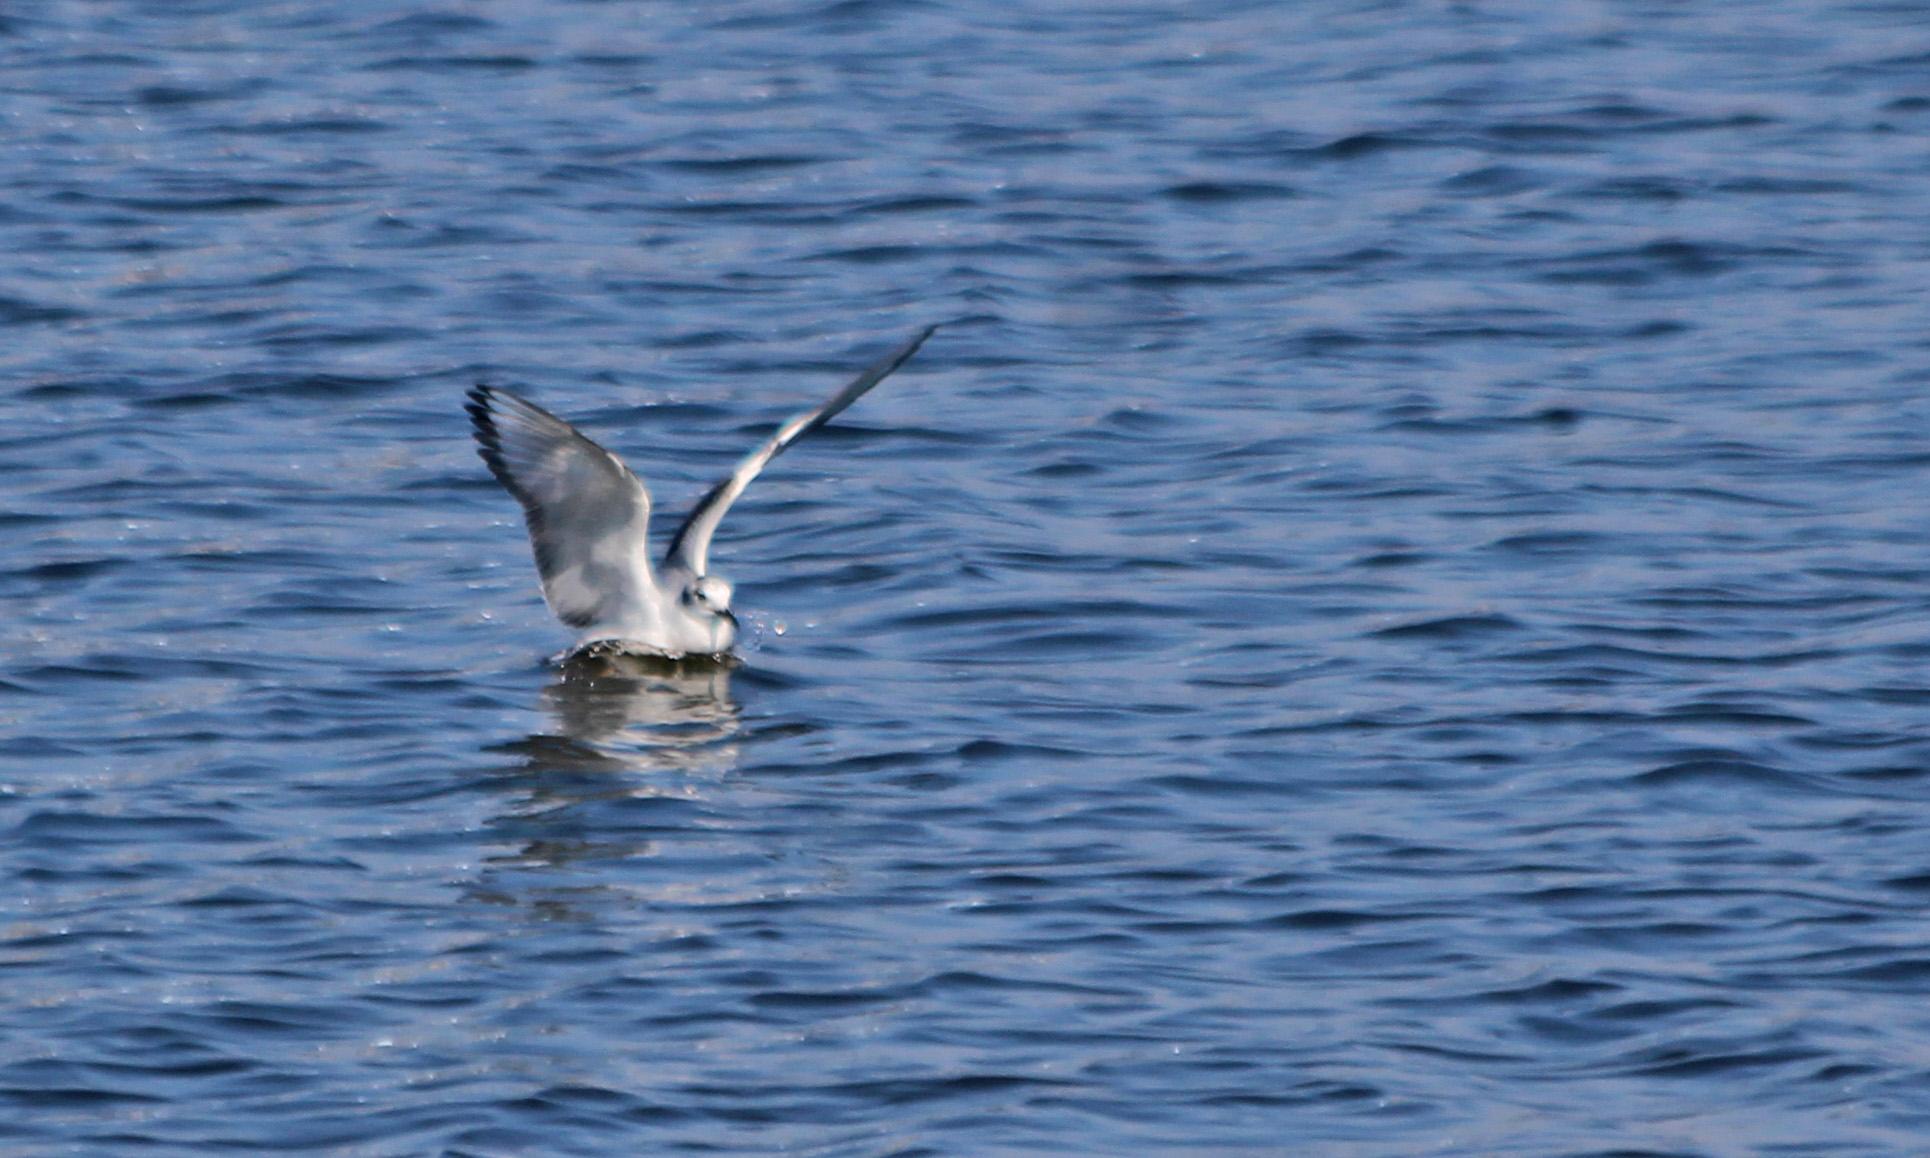 210420 bonapartes gull (2)